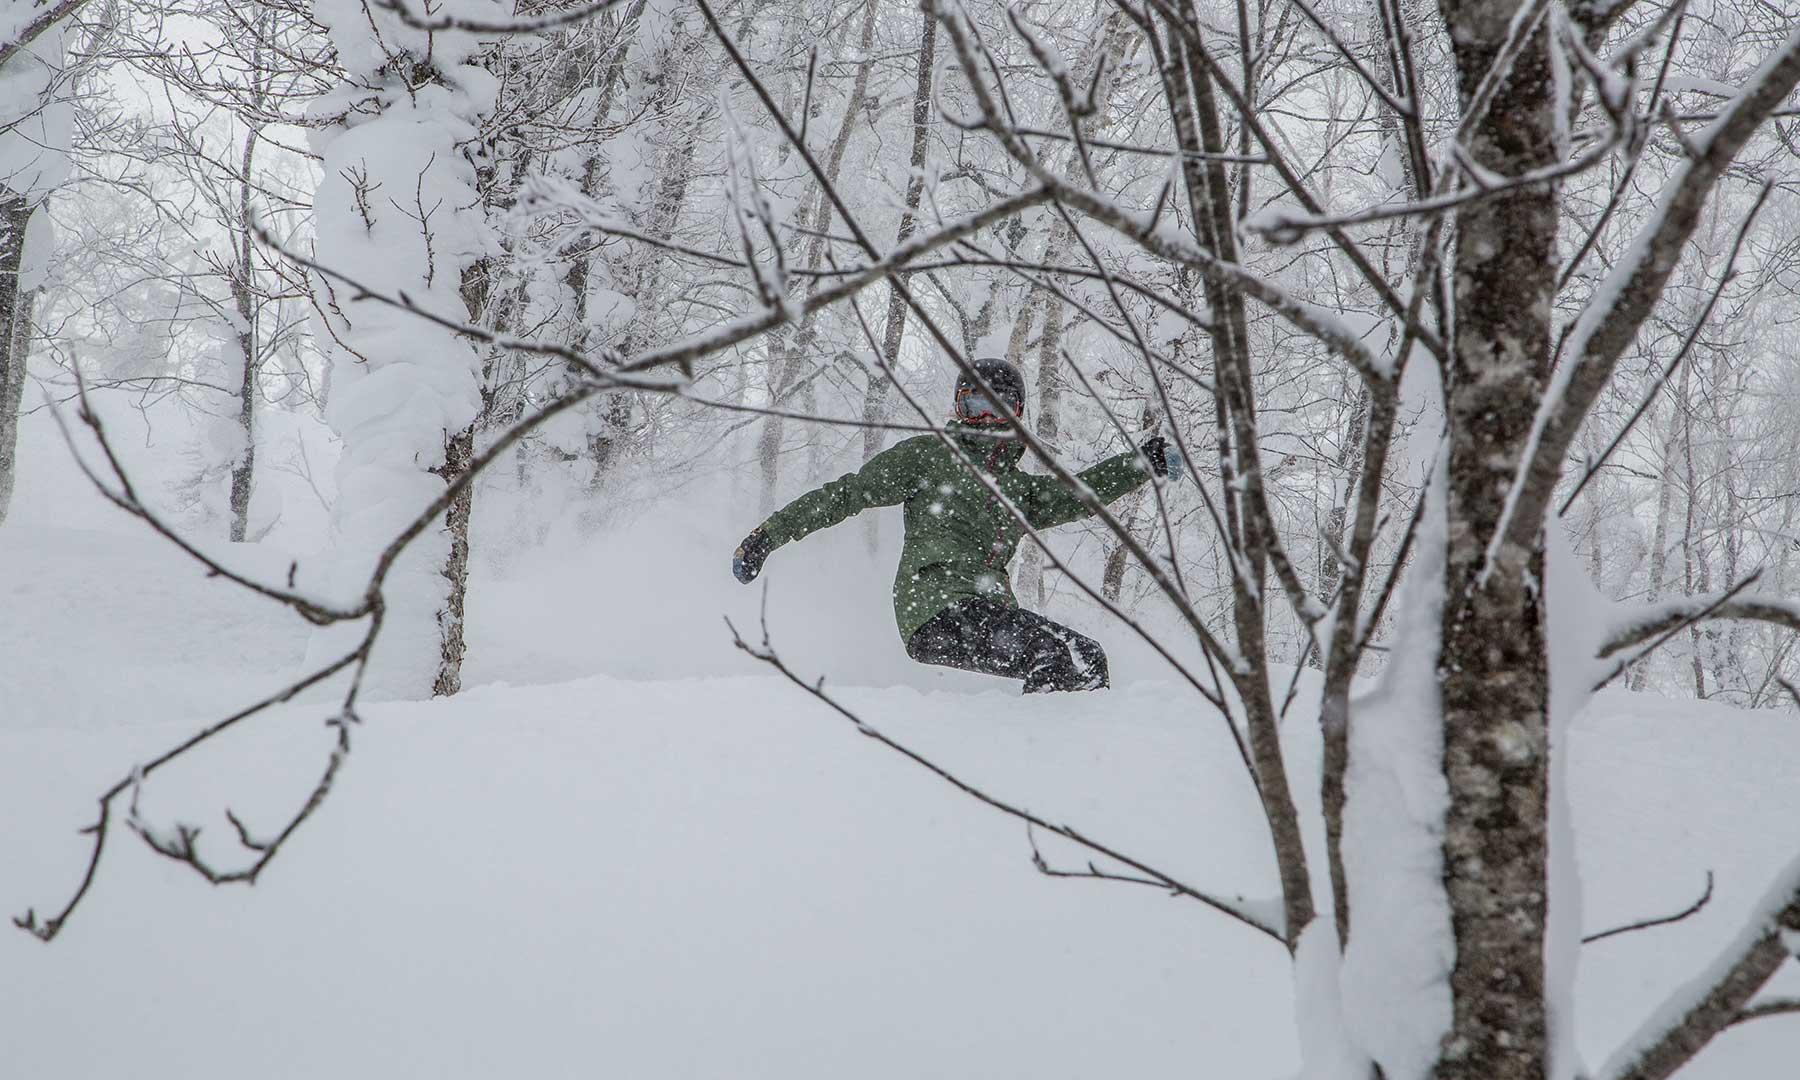 Nicki snowboarding in Rusutsu